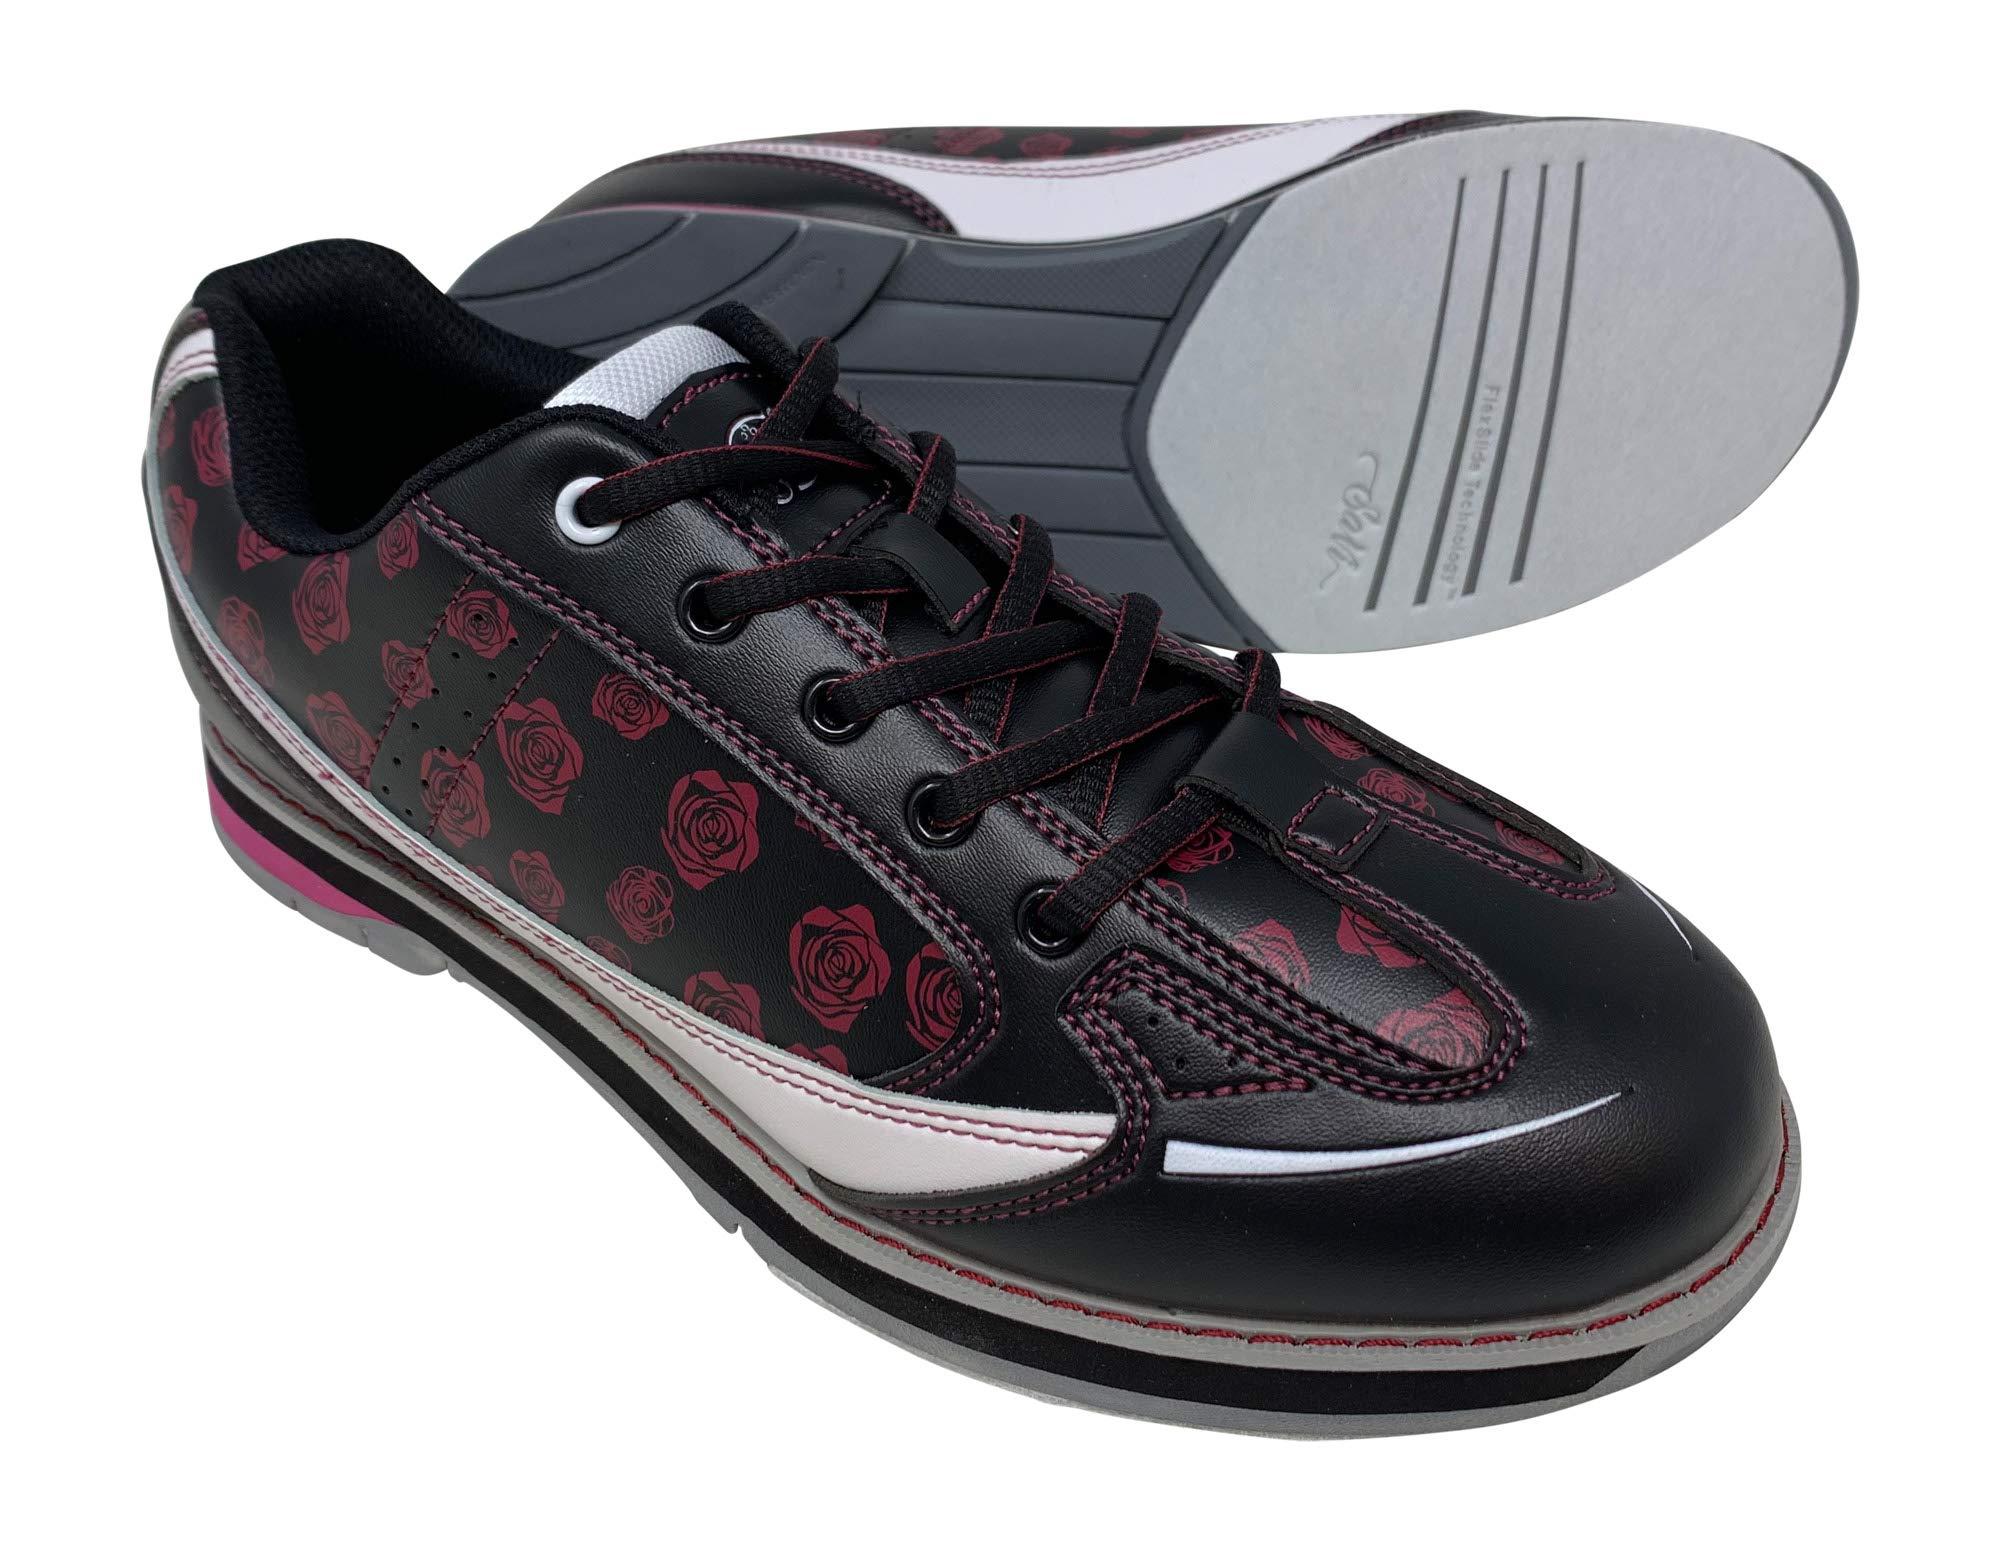 SaVi Bowling Women's Roses Black/Red/White Bowling Shoes (6)